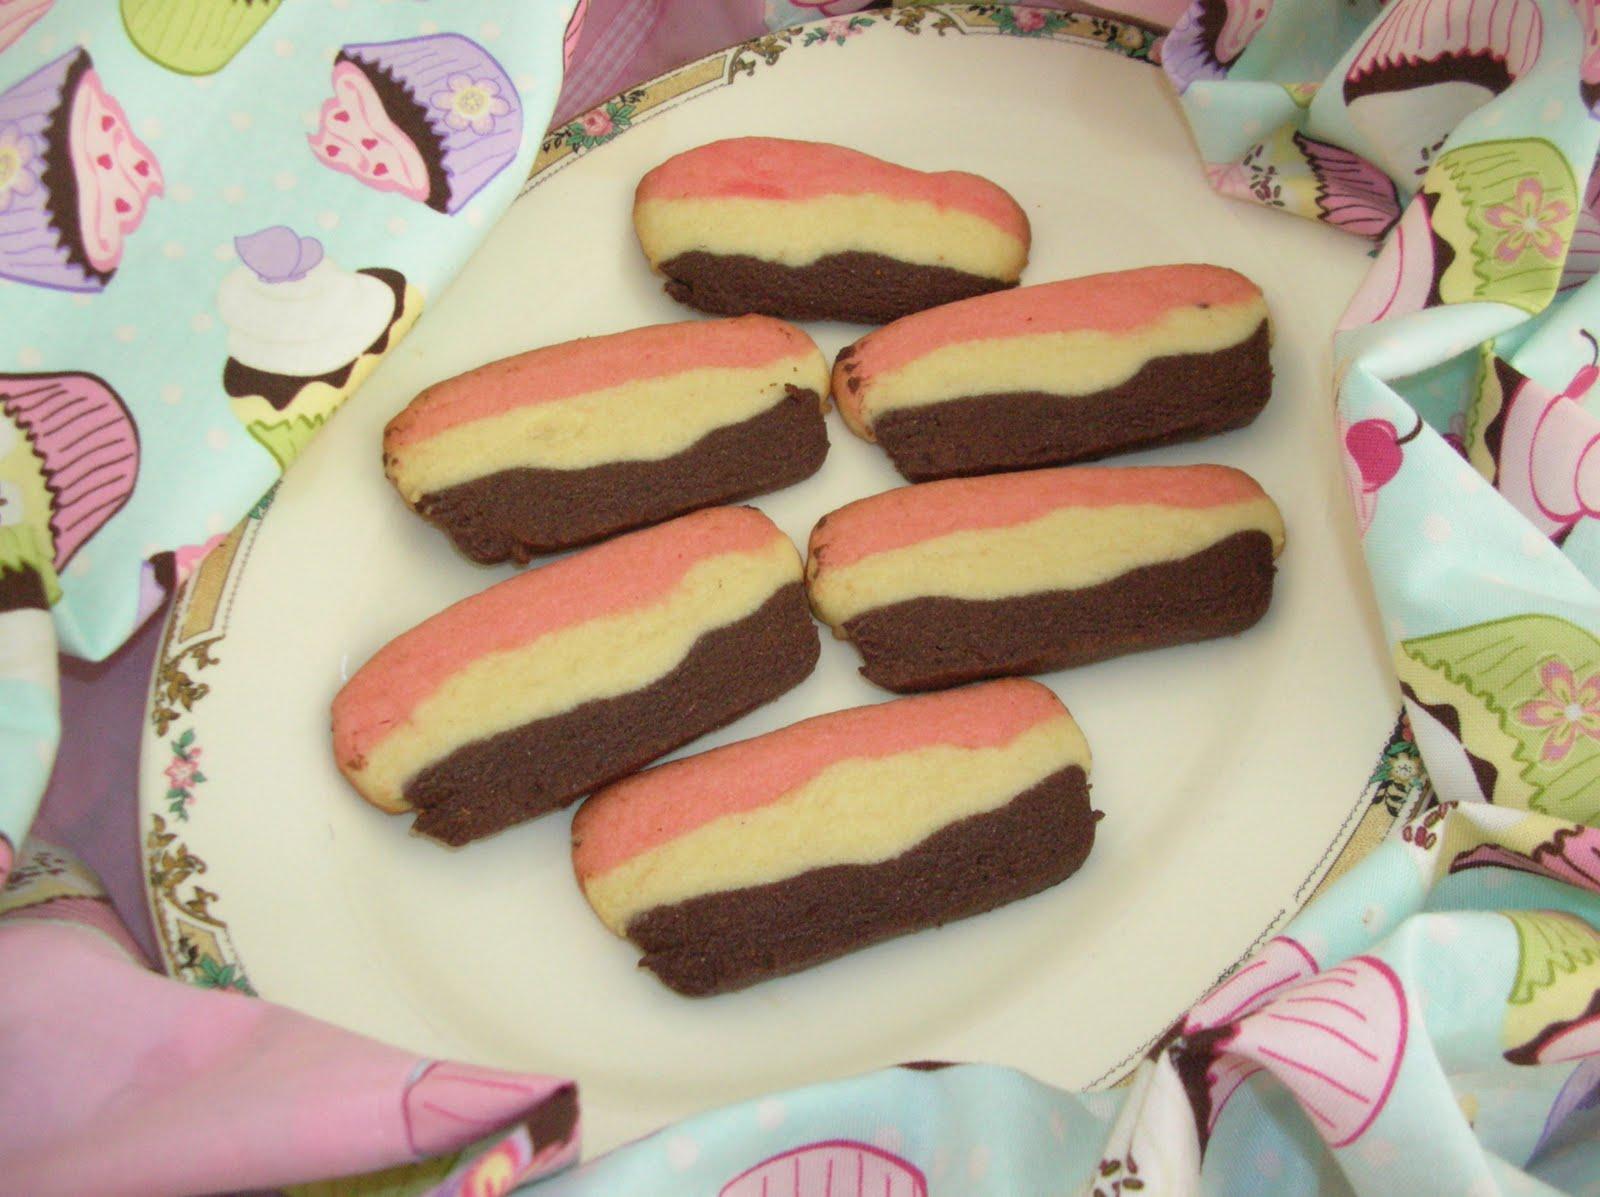 neapolitan cookies cocoajoe neapolitan cookies neapolitan cookies